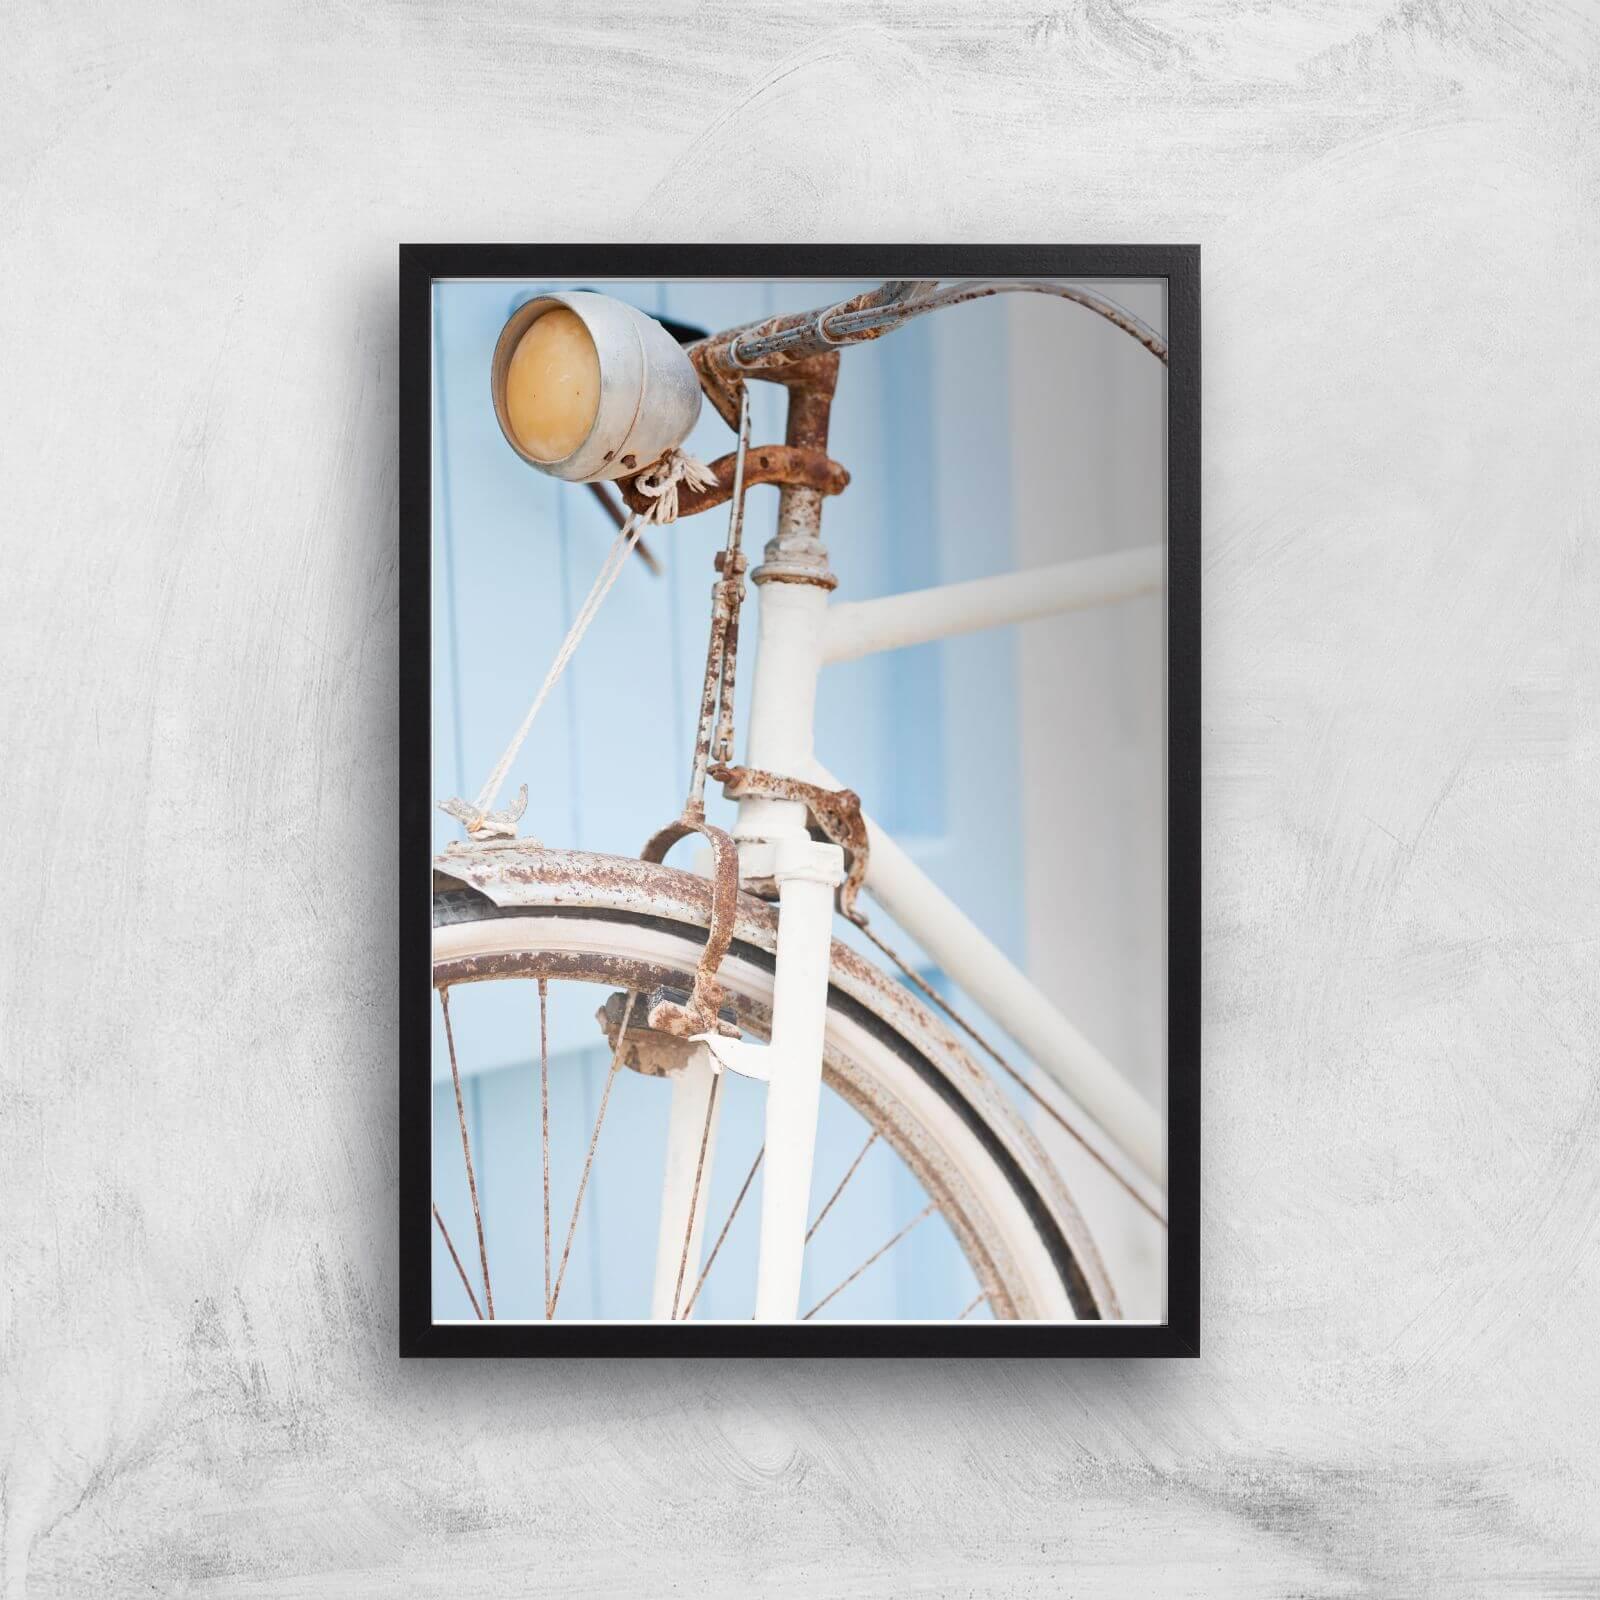 Rusty Bicycle Giclee Art Print   A3   Black Frame